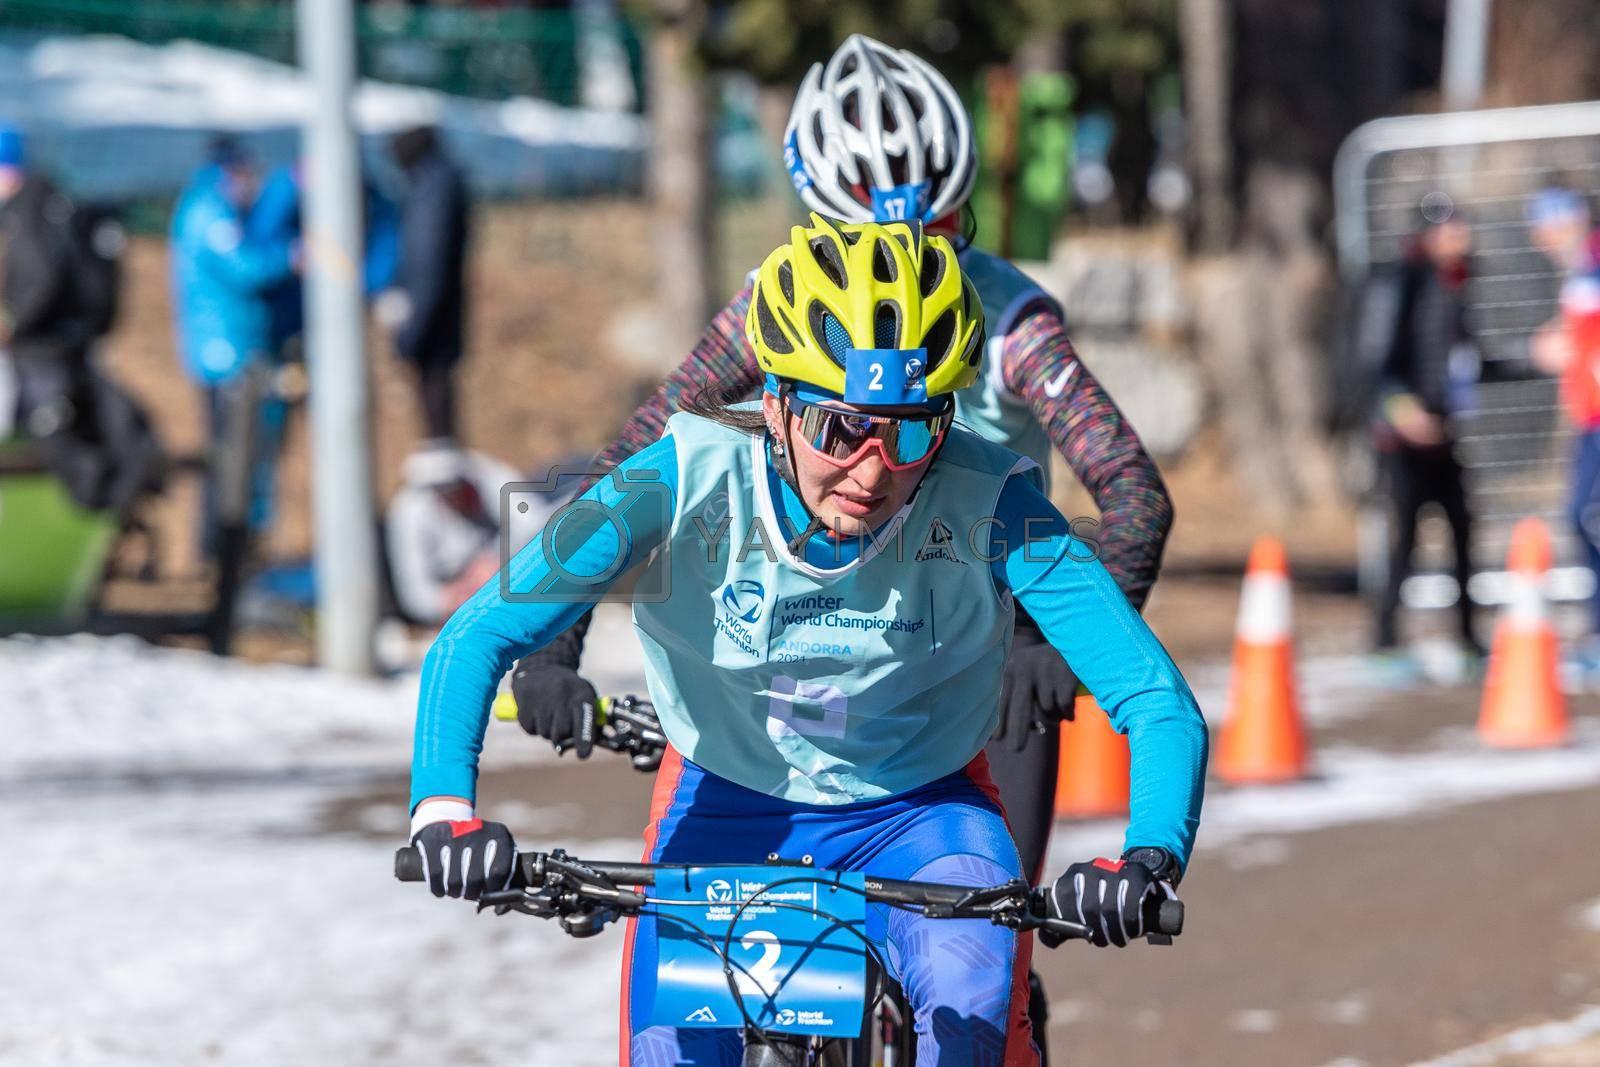 Naturlandia, Andorra : 2021 March 20 : Svetlana Sokolova RUS in the 2021 World Triathlon Winter Championships Andorra